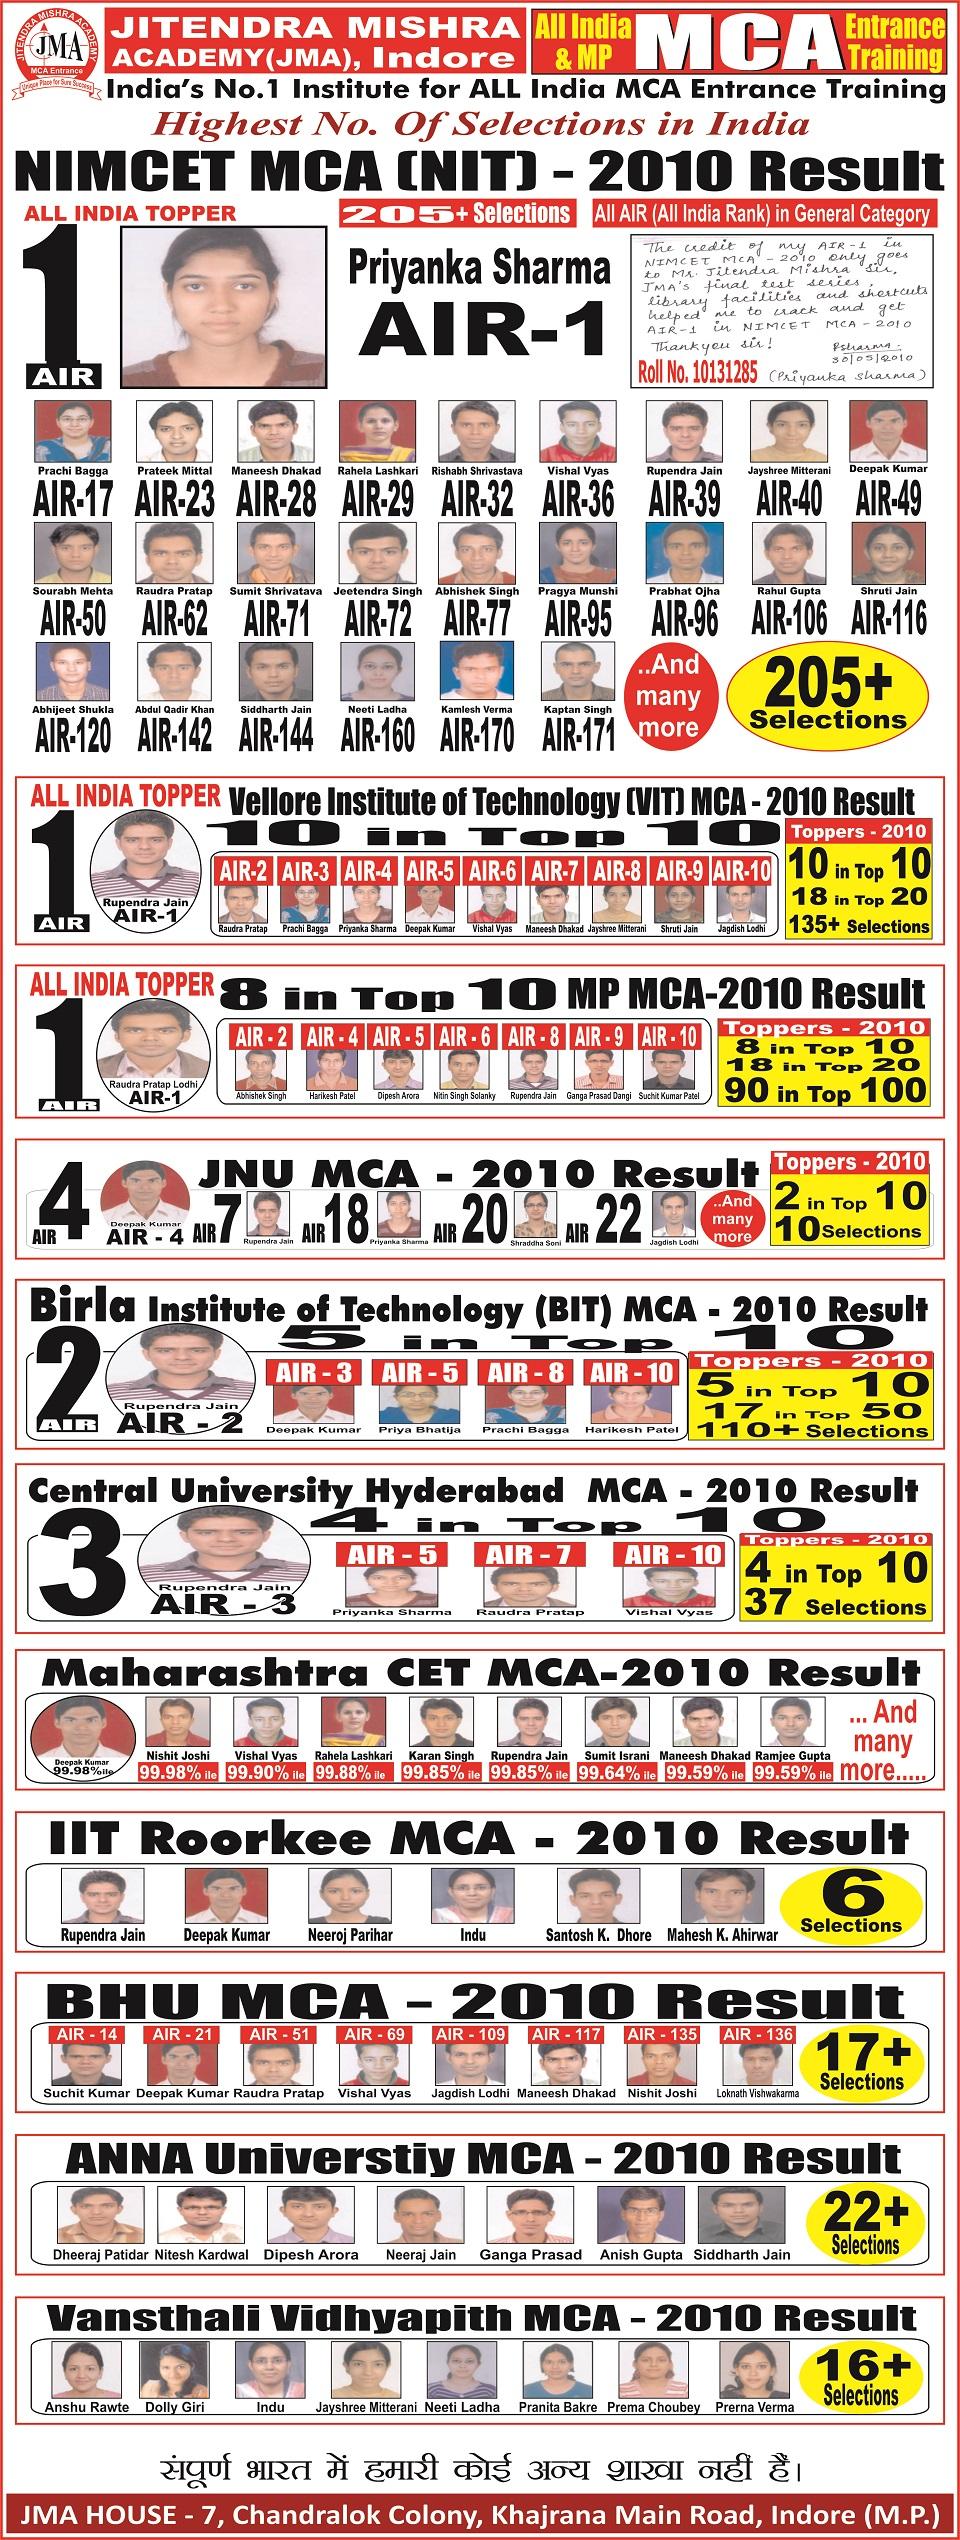 MCA 2010 Results